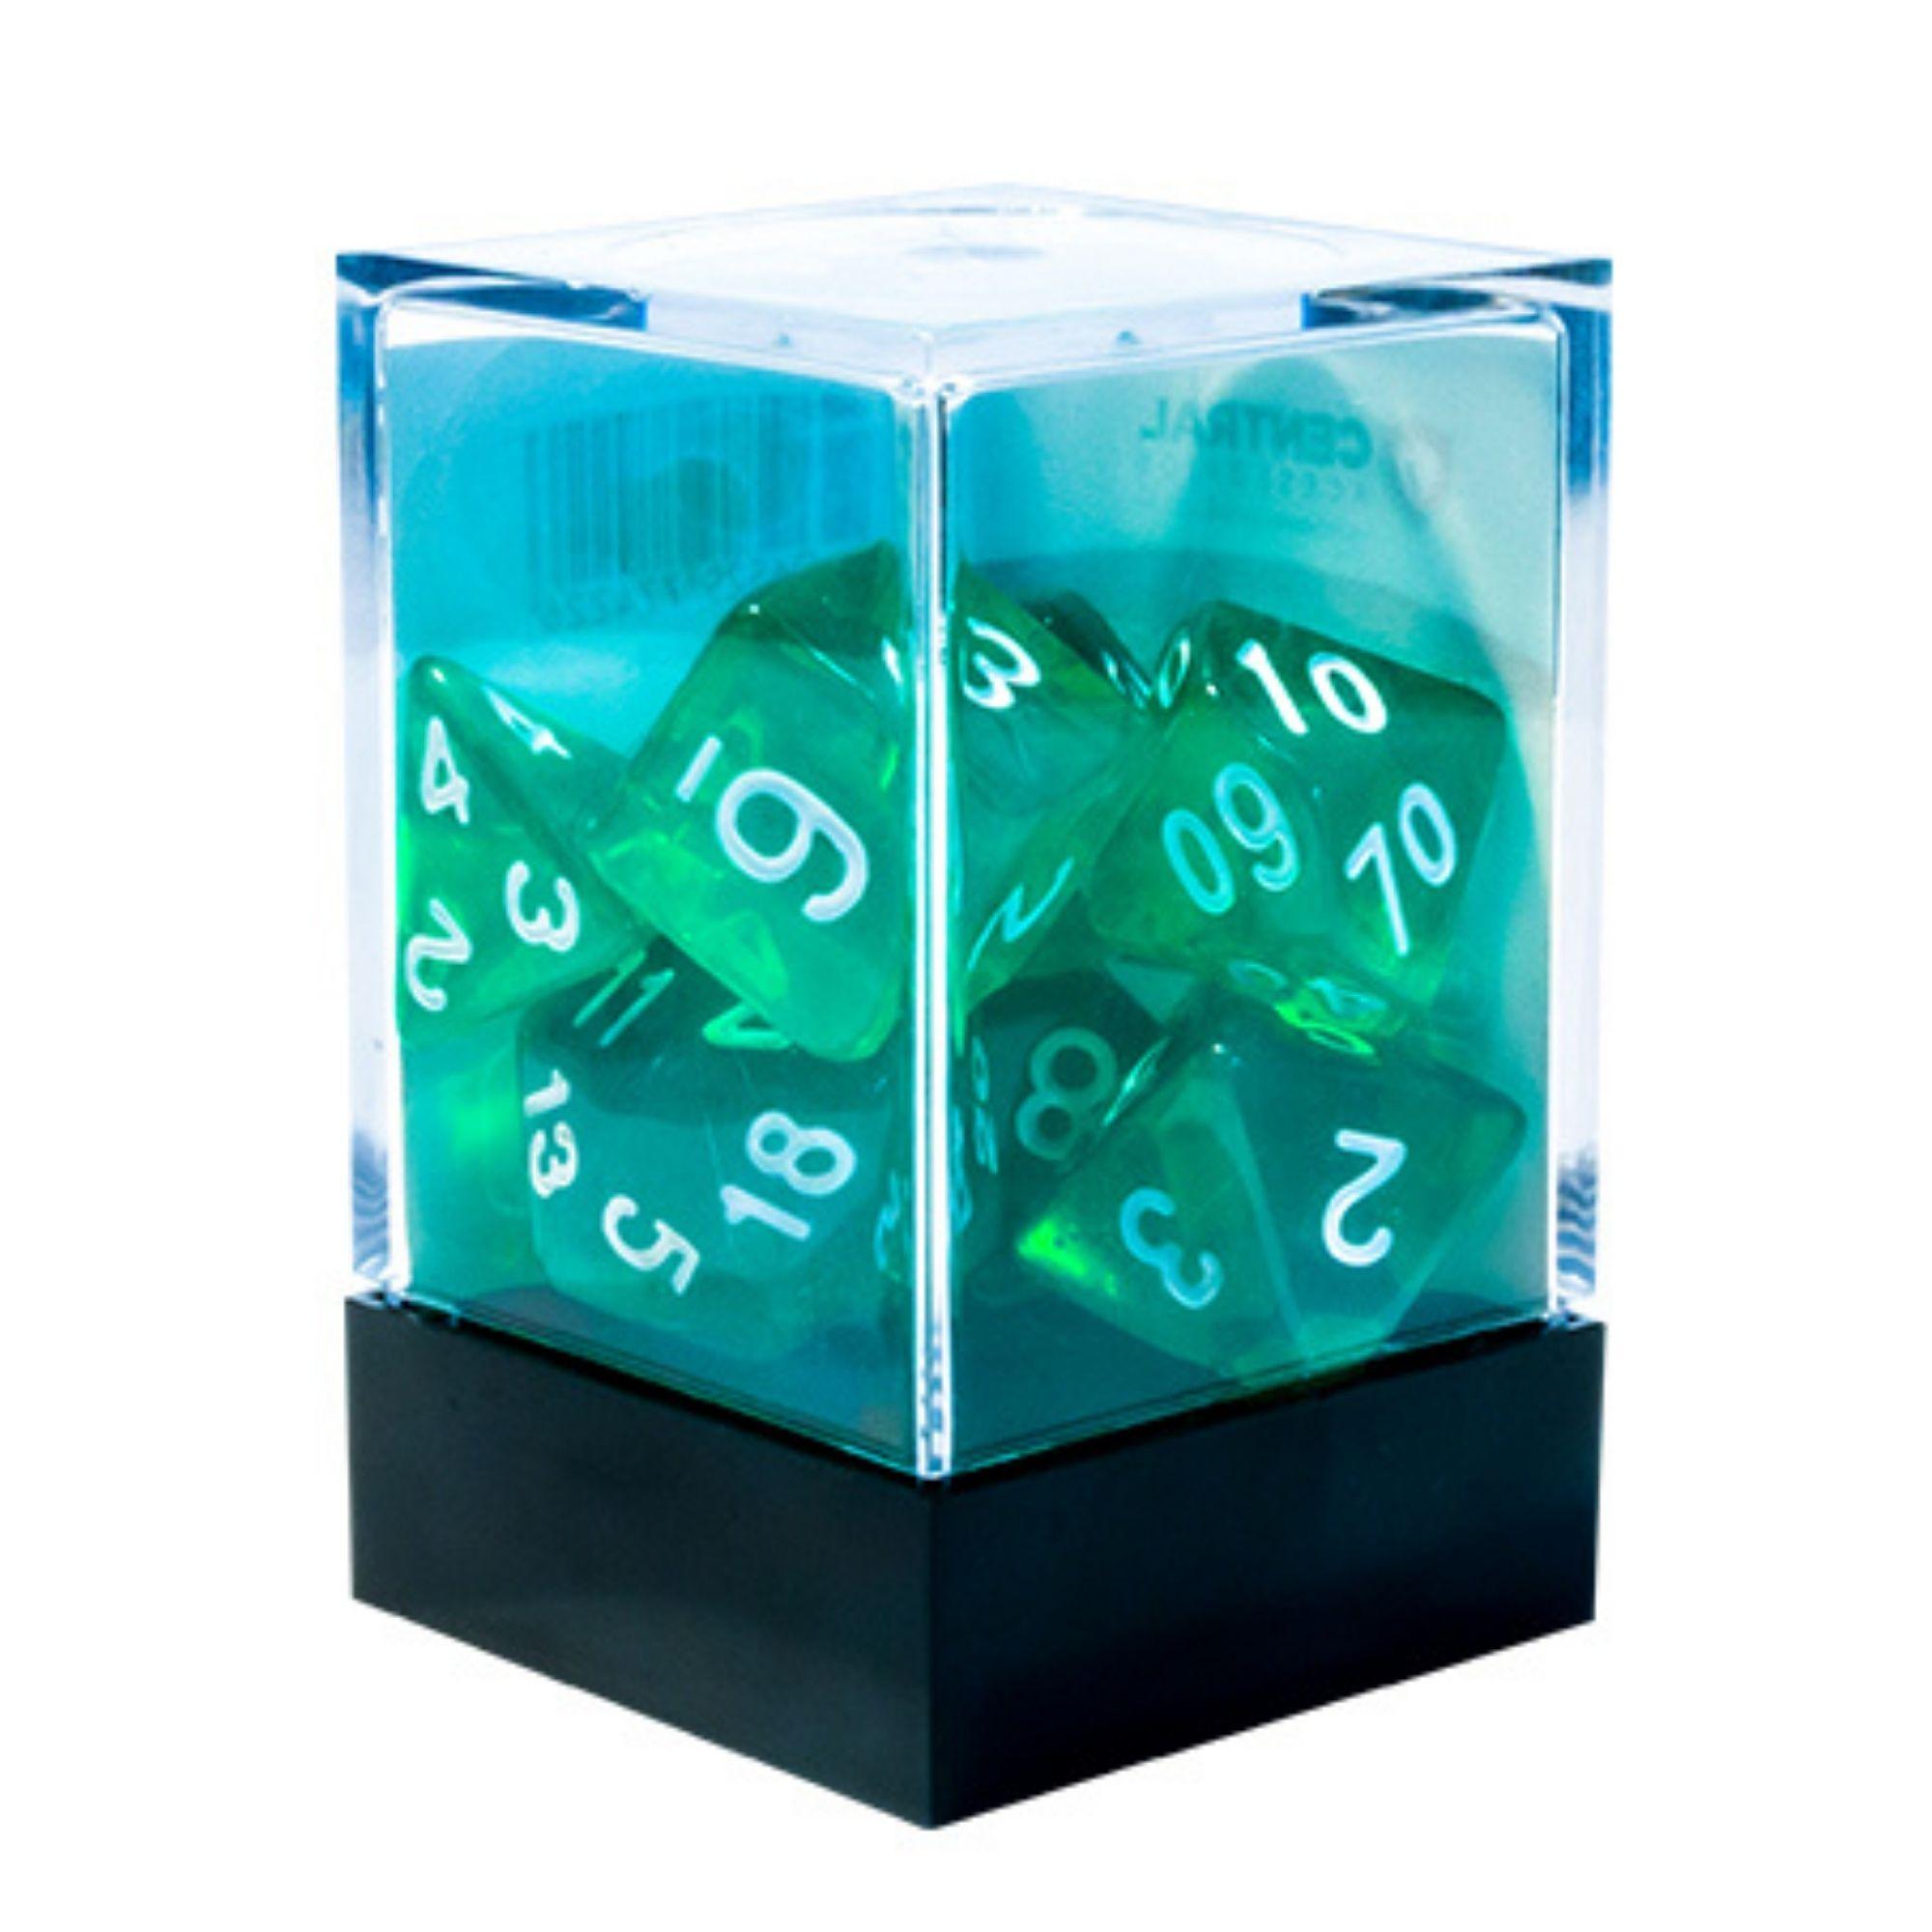 Central Dices Conjuntos 7 Dados RPG Translúcido Verde e Branco